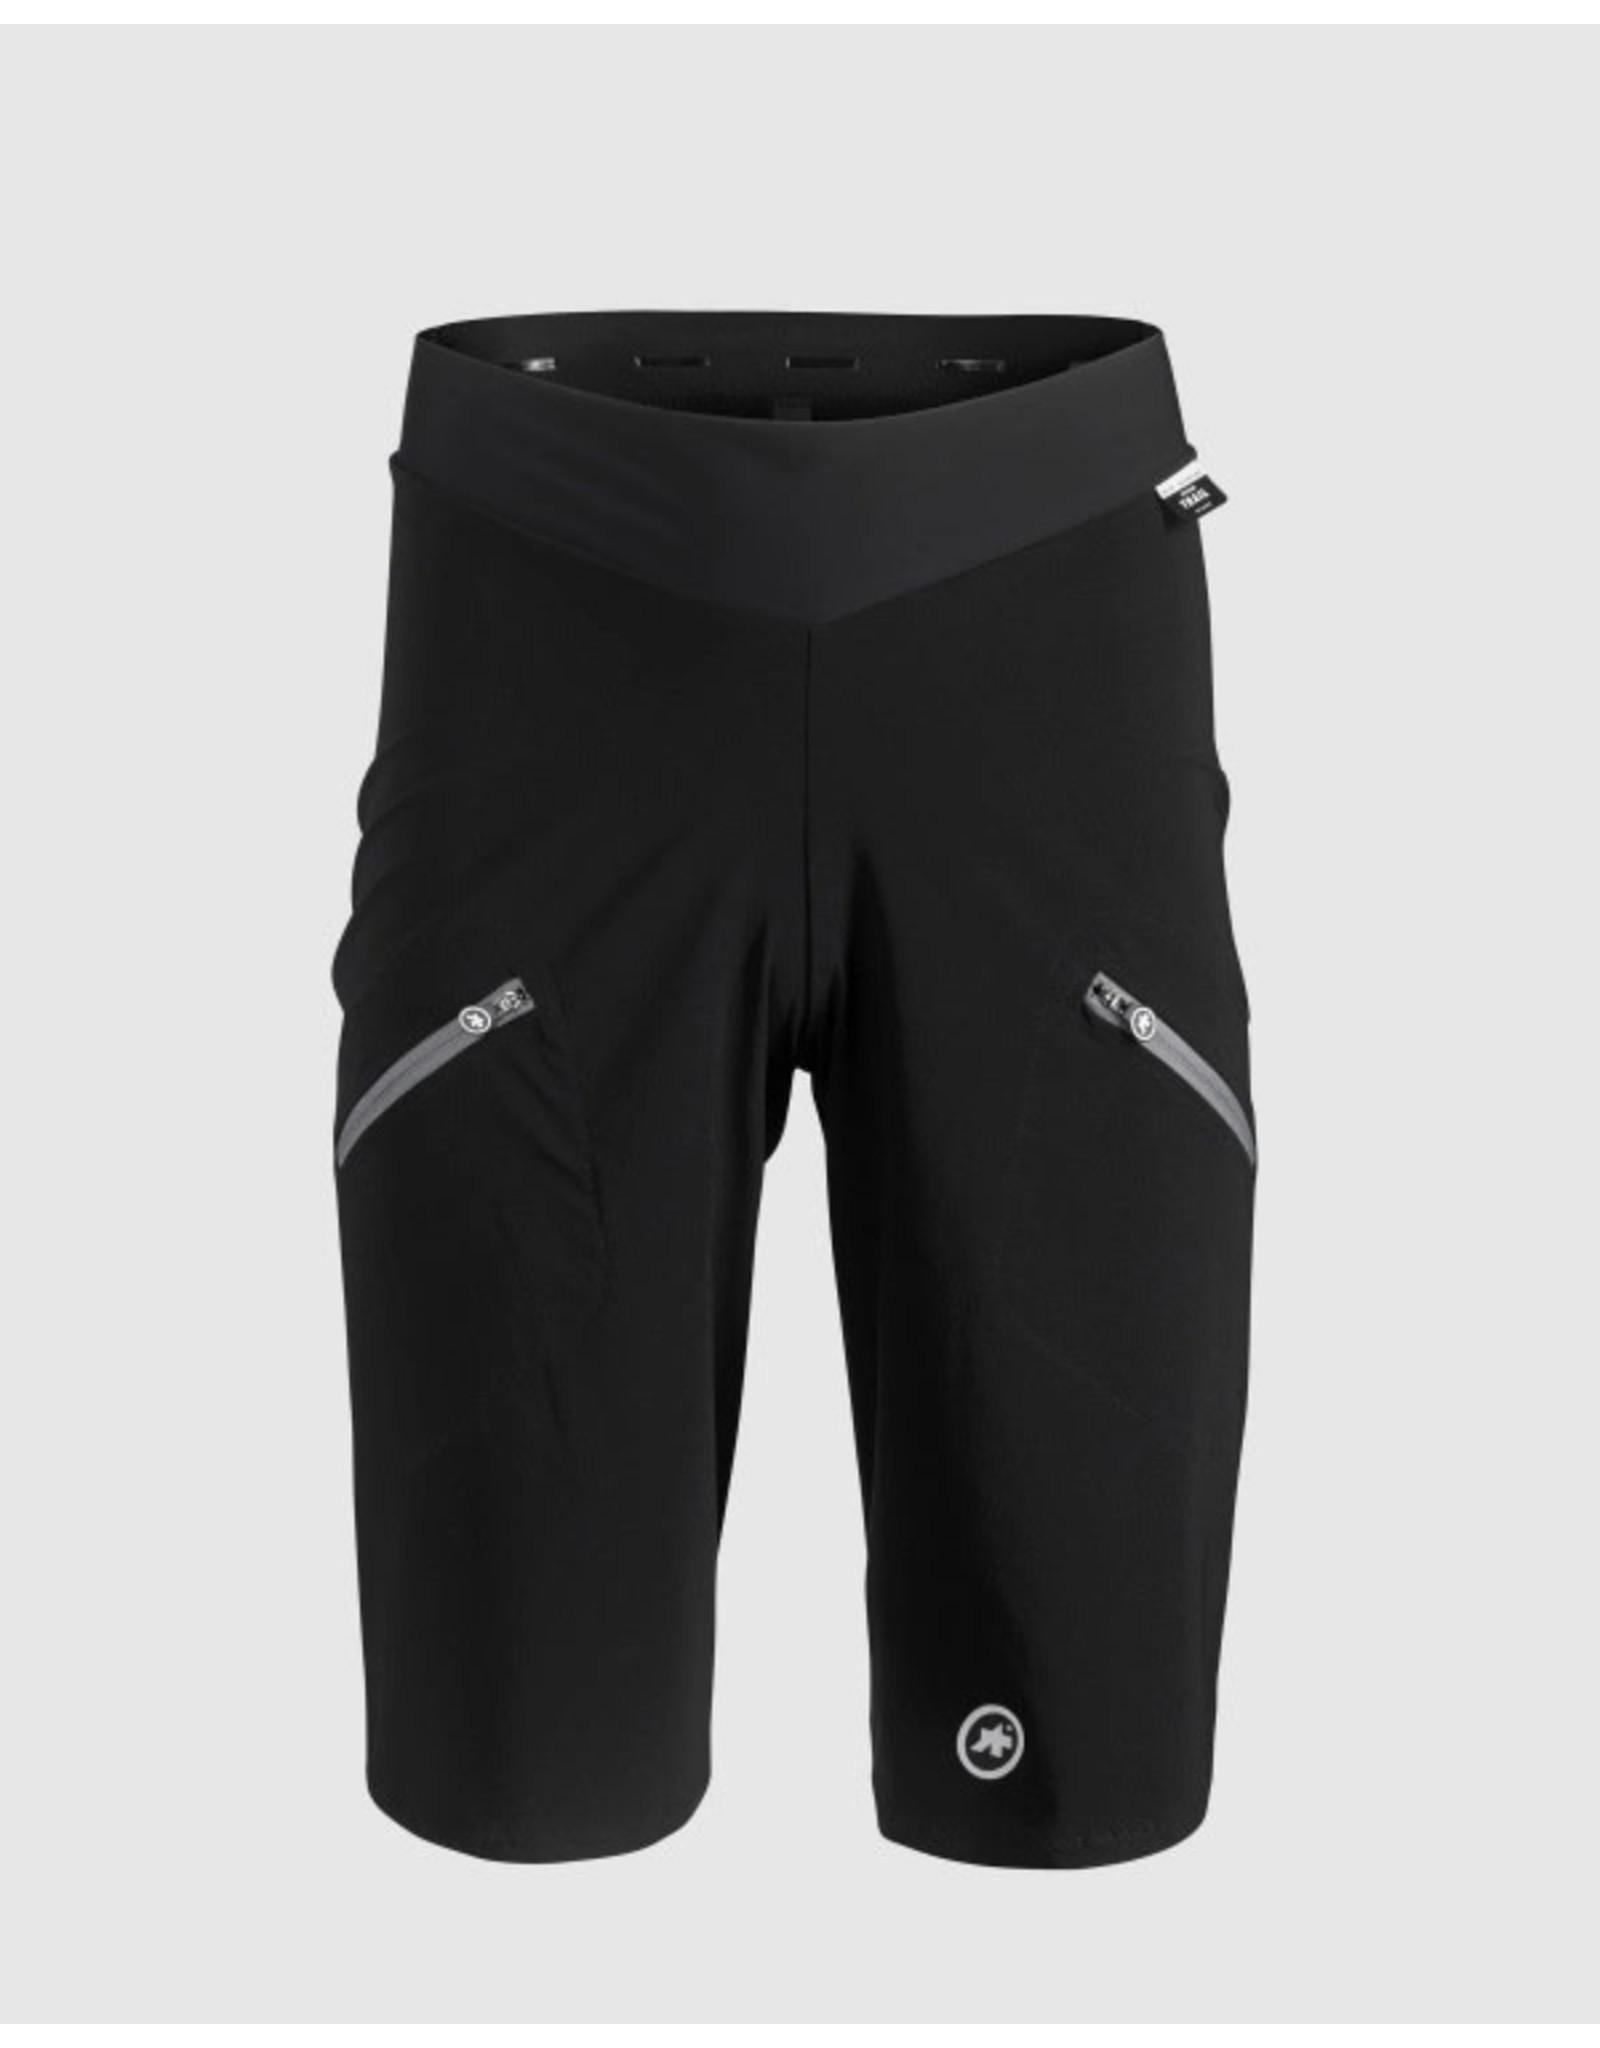 Assos '21, Assos, Men's Trail Cargo Shorts